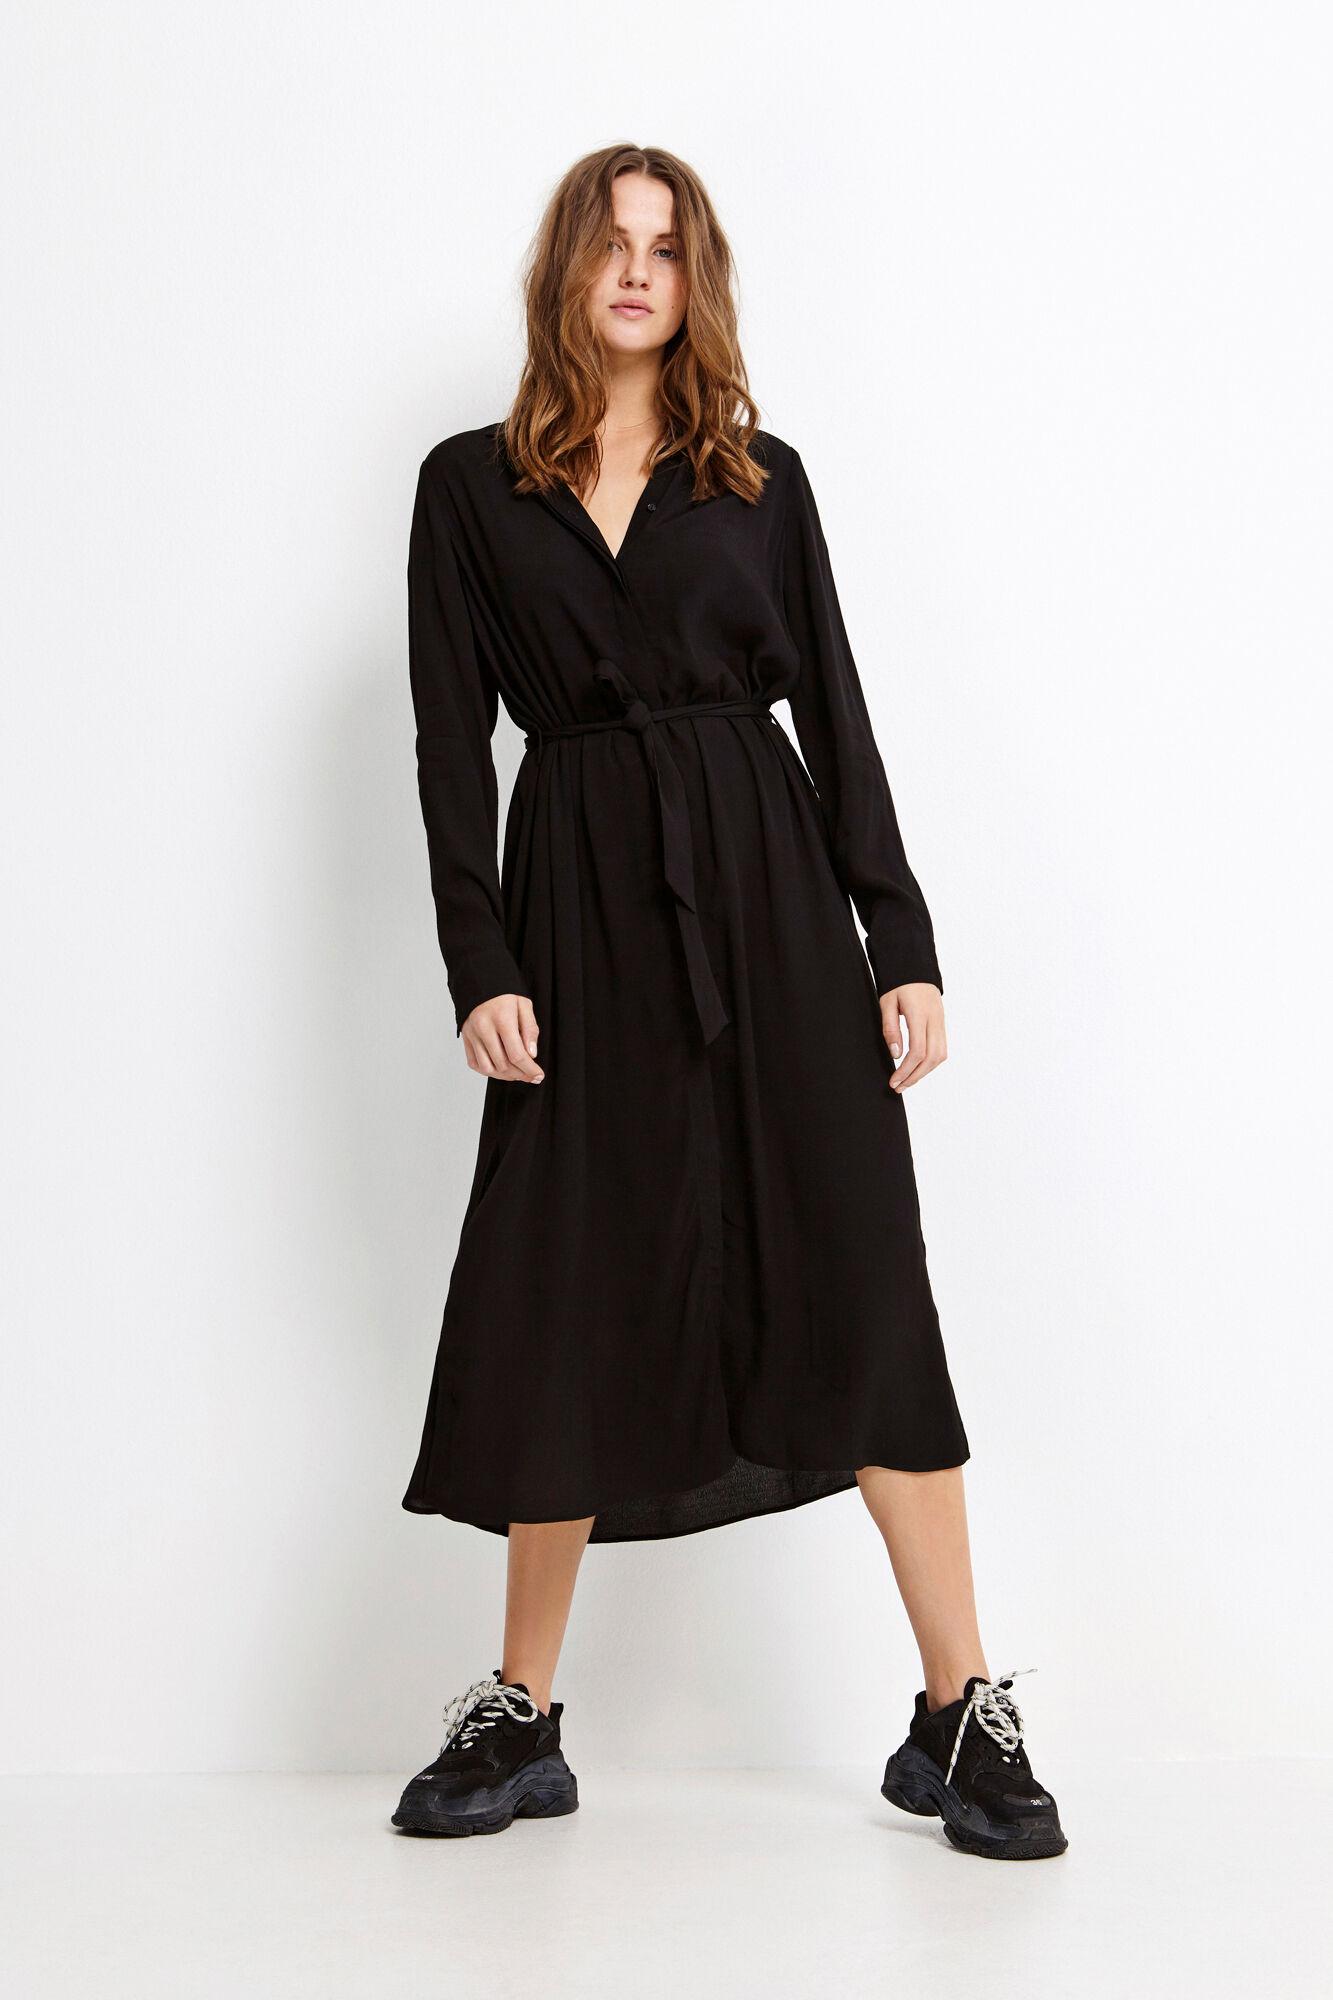 ENDATE LS DRESS 6626, BLACK